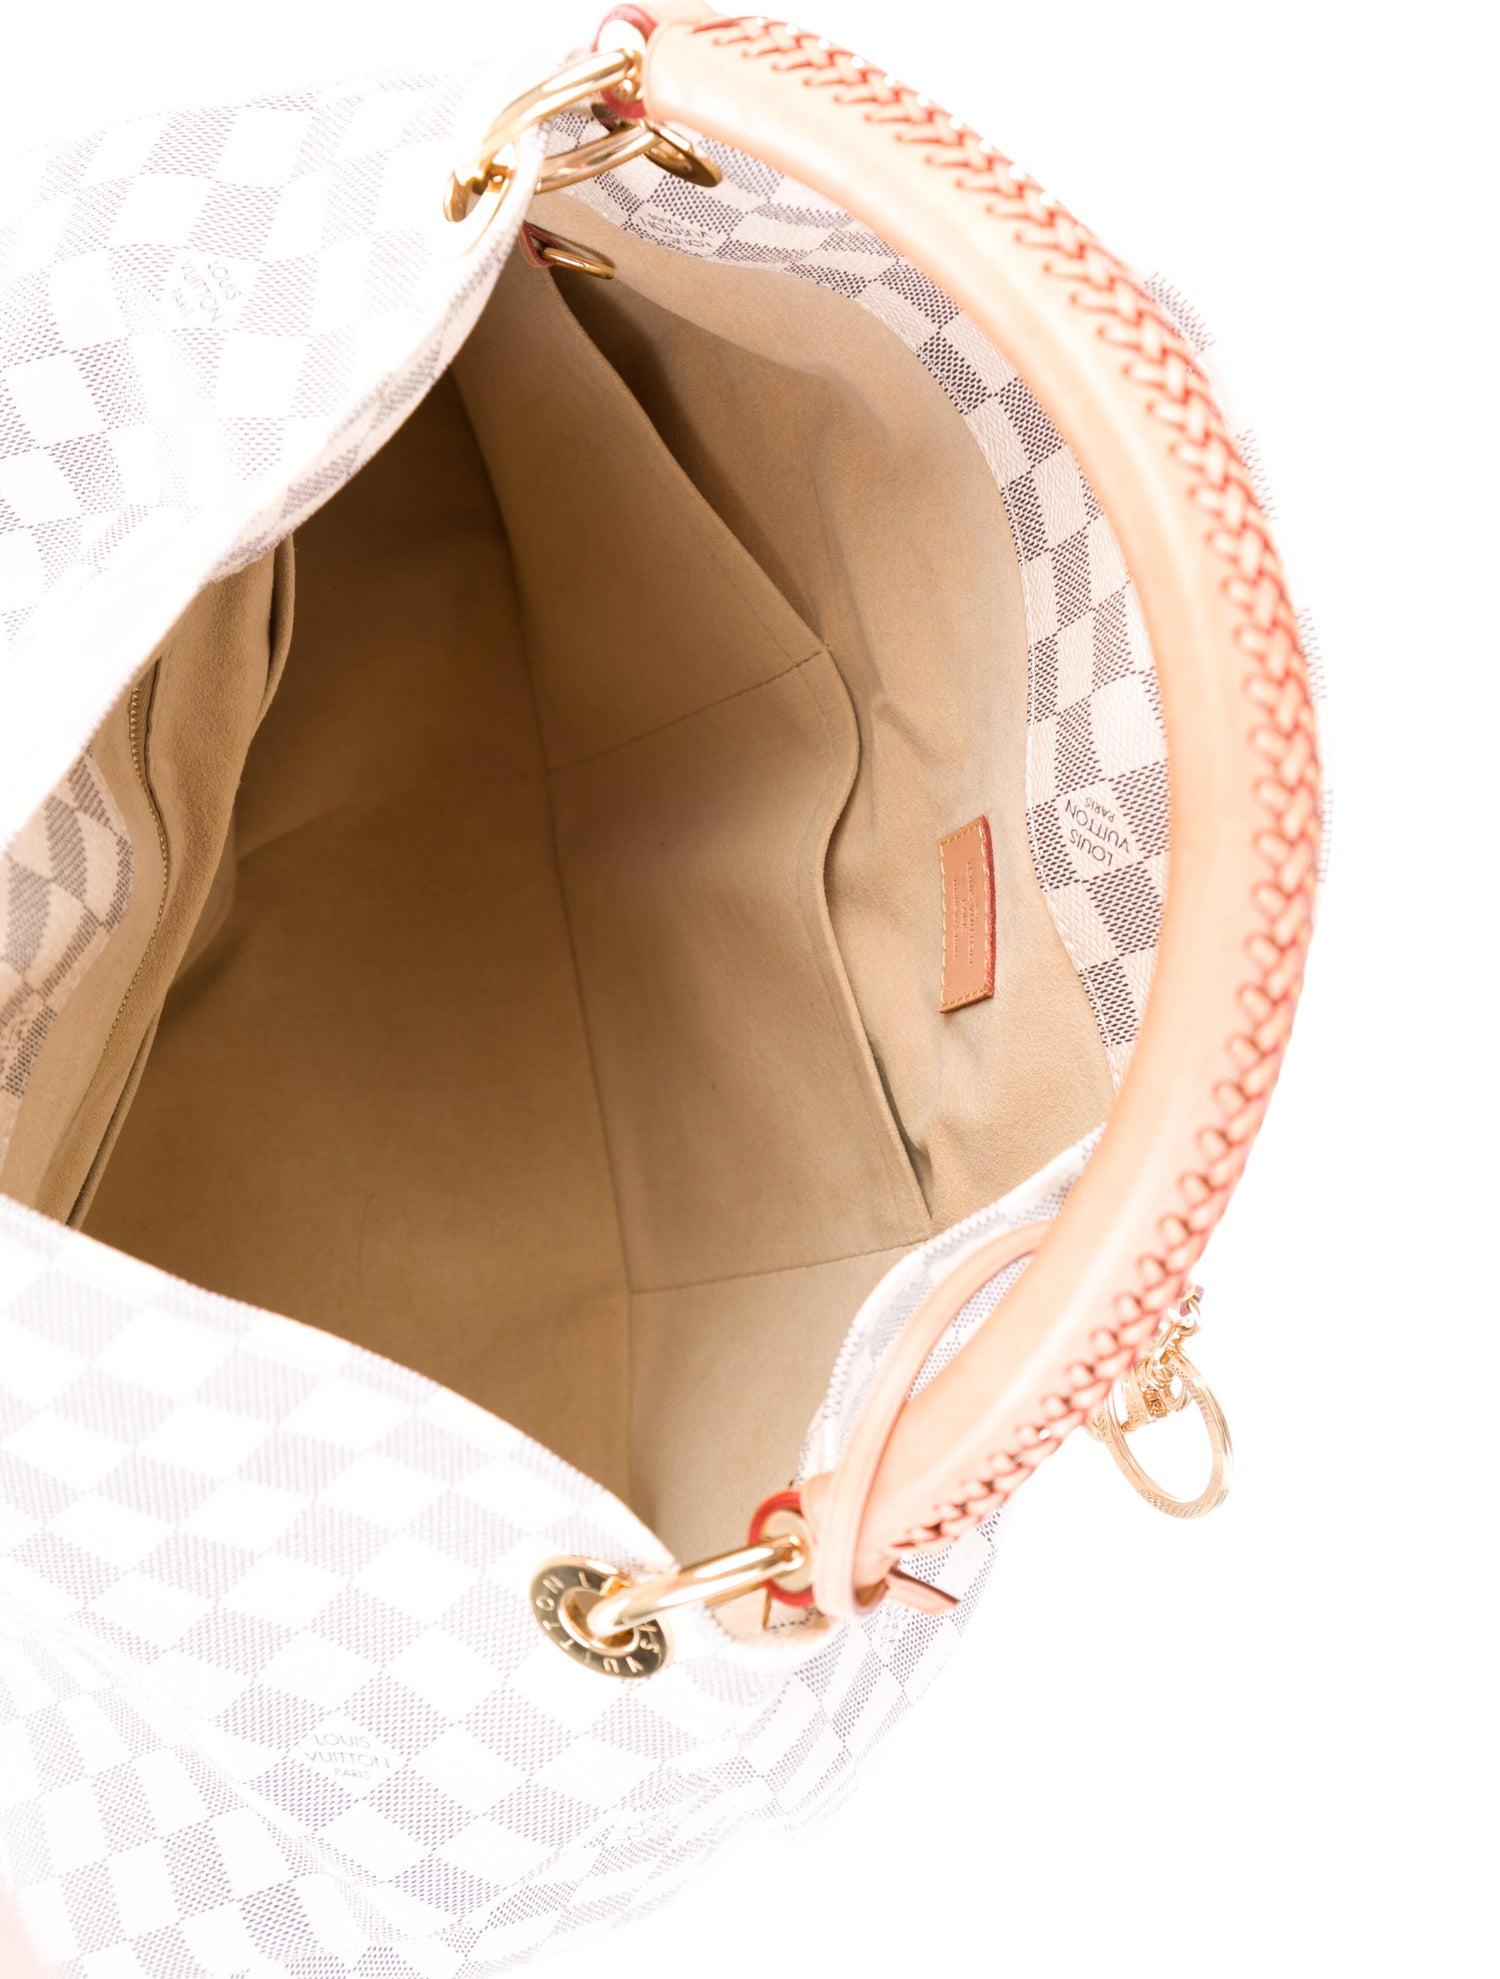 Louis-Vuitton-Artsy-MM-Damier-Azur_16199C.jpg